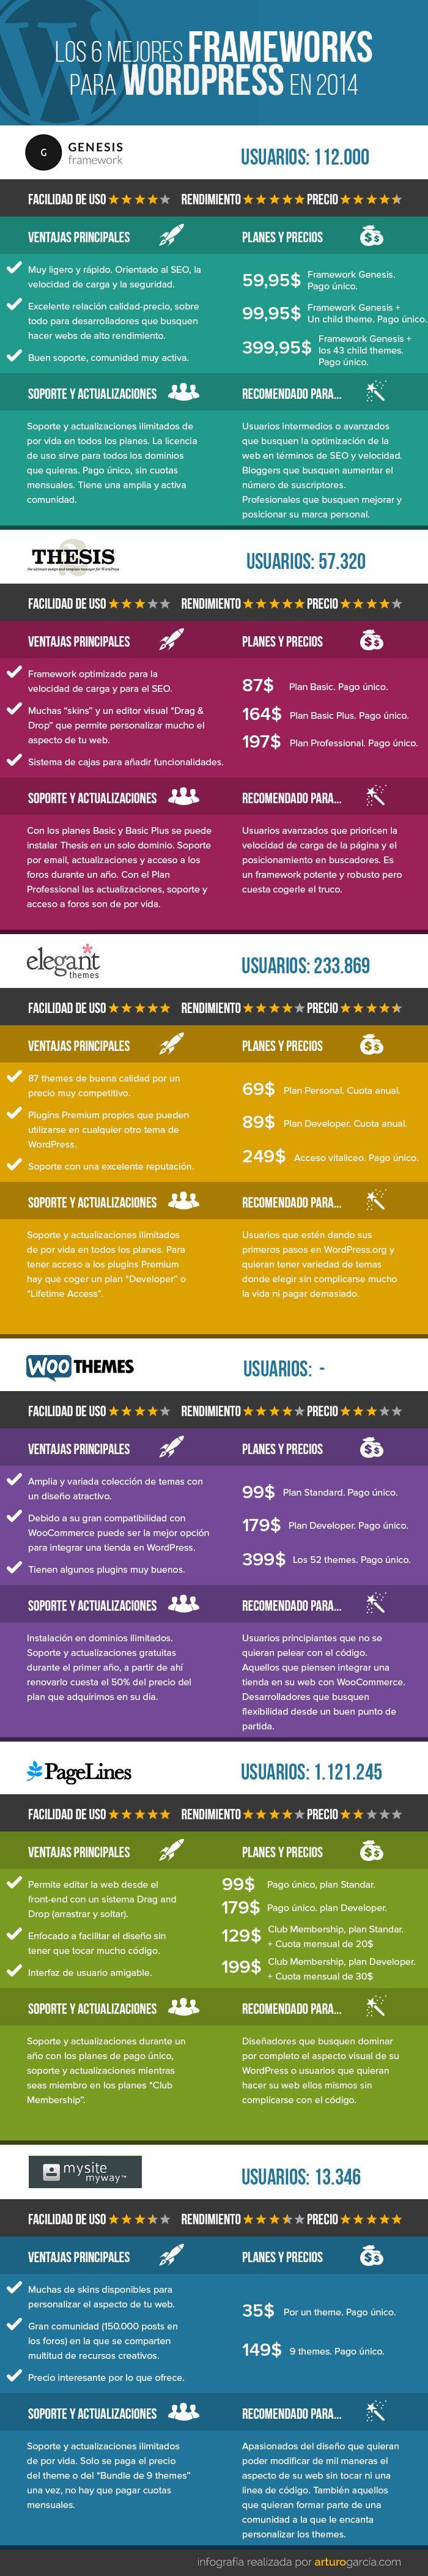 Los 6 mejores frameworks para WordPress #infografia